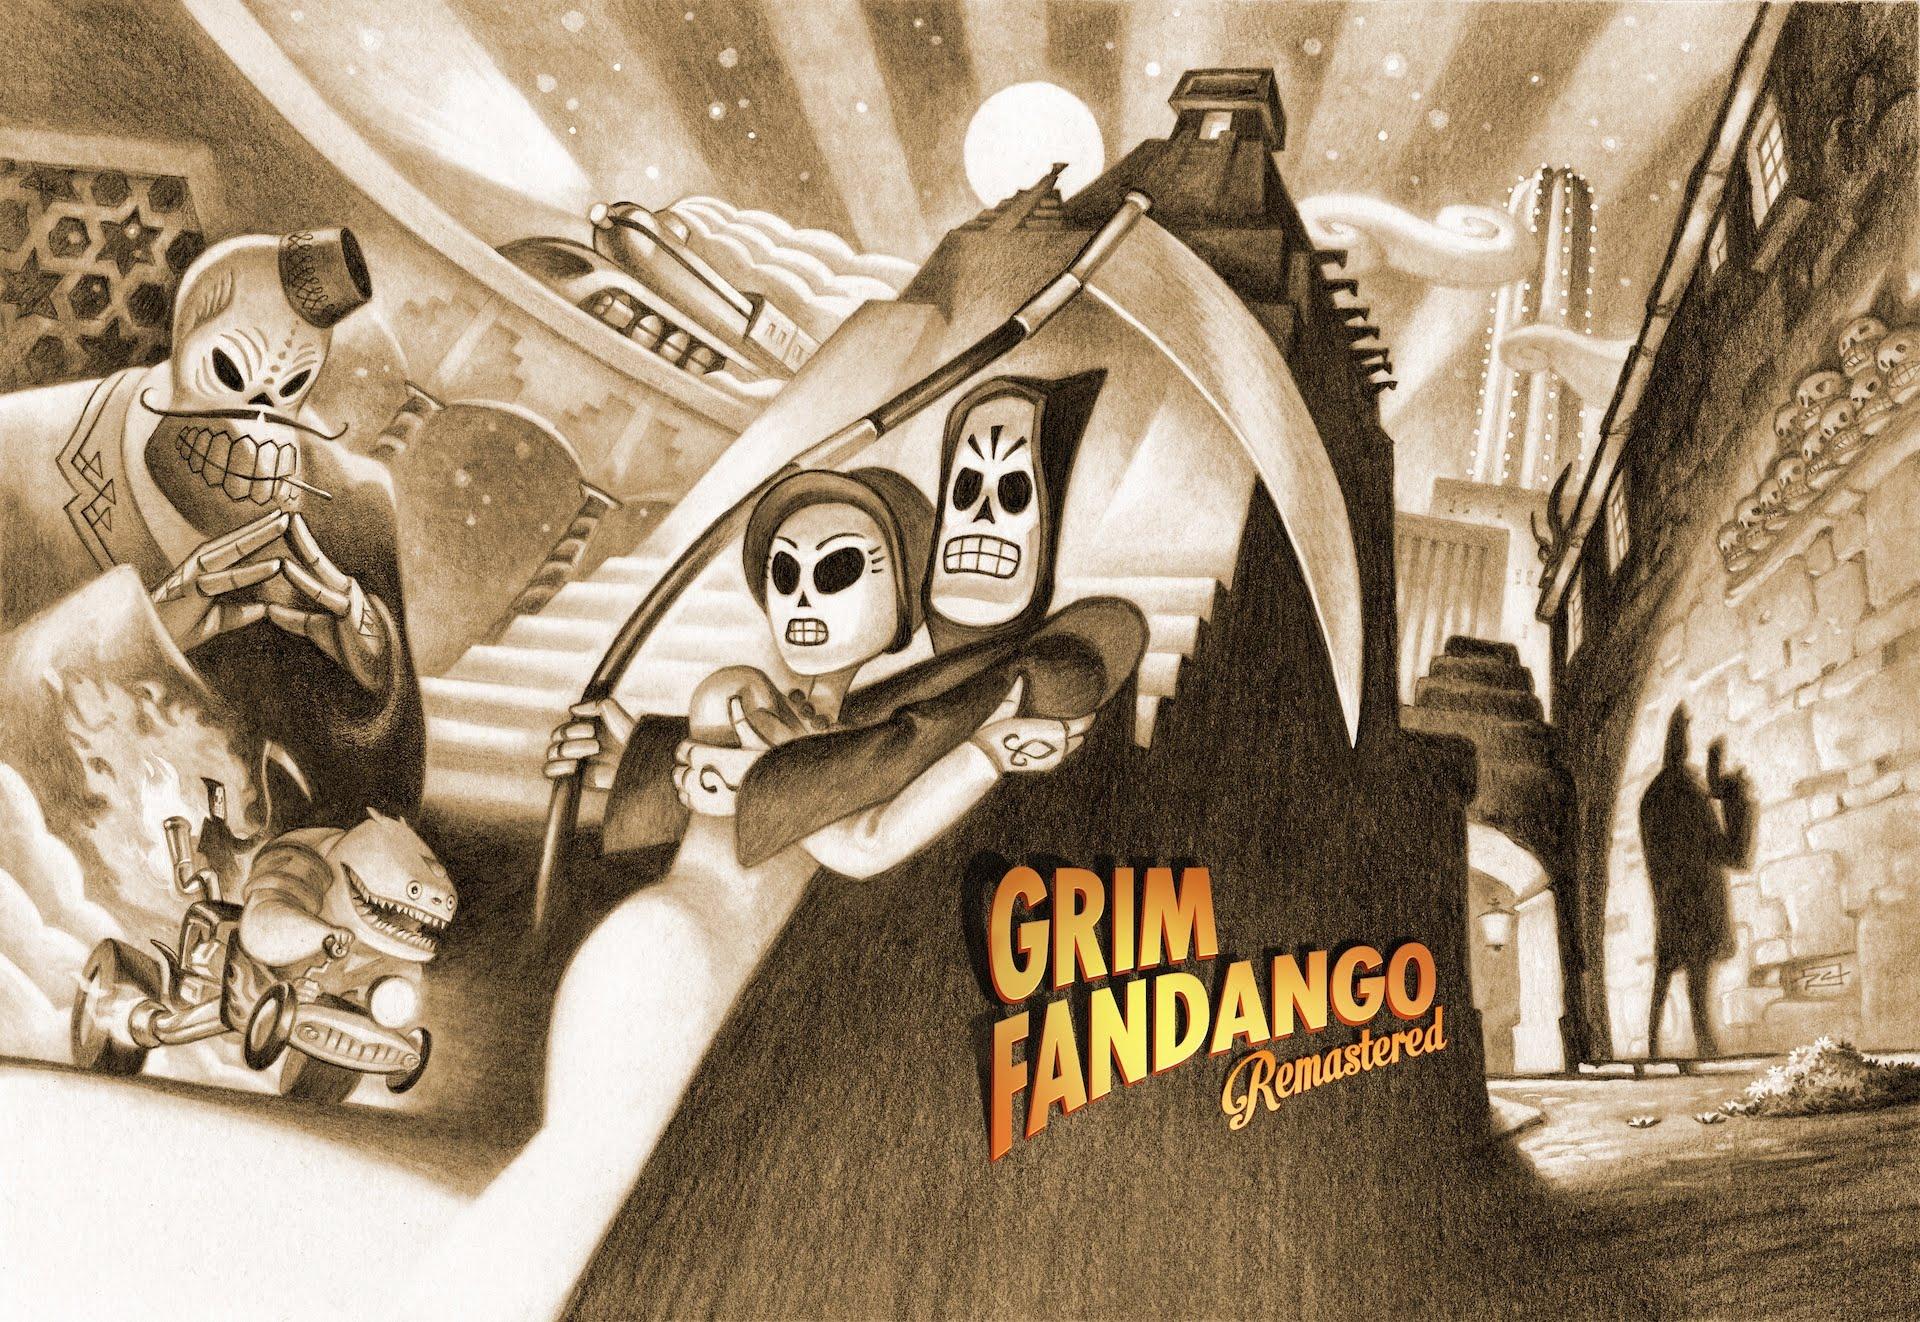 Nice wallpapers Grim Fandango 1920x1322px